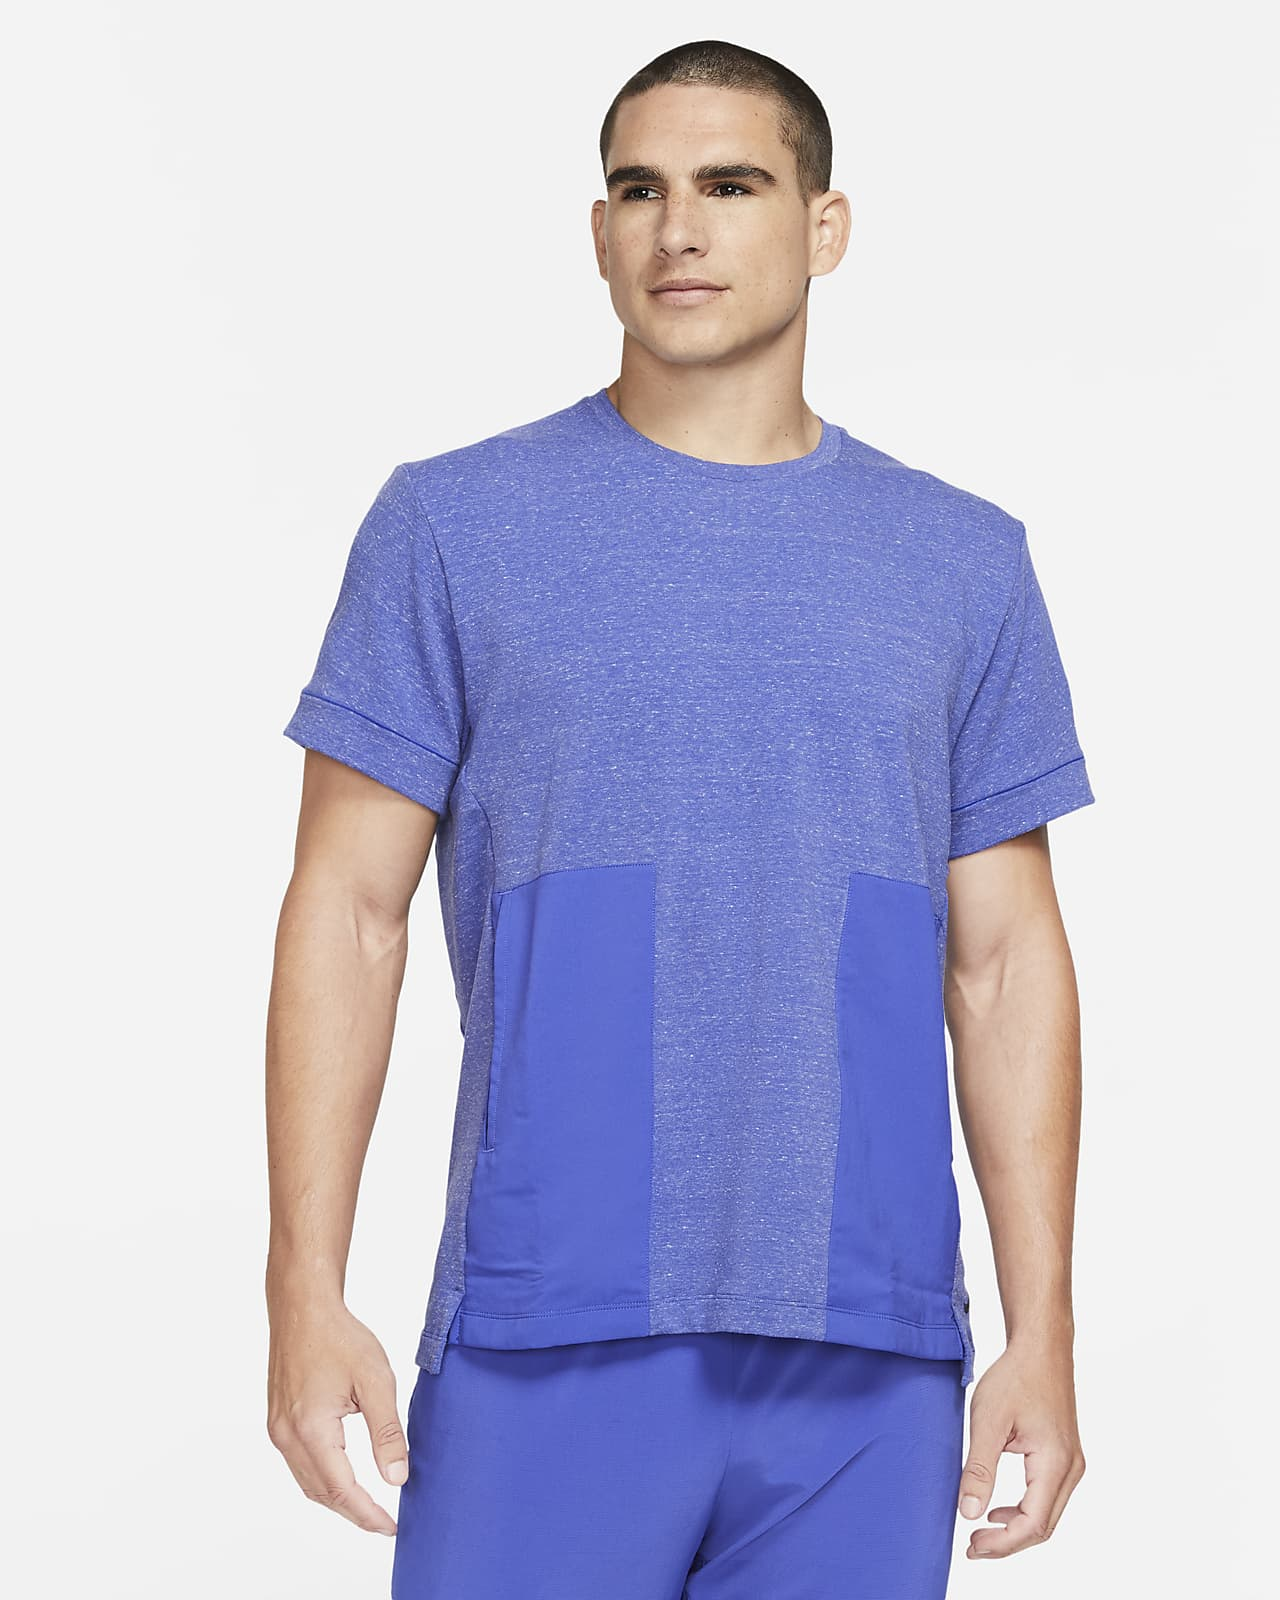 Kortärmad tröja Nike Yoga Dri-FIT för män